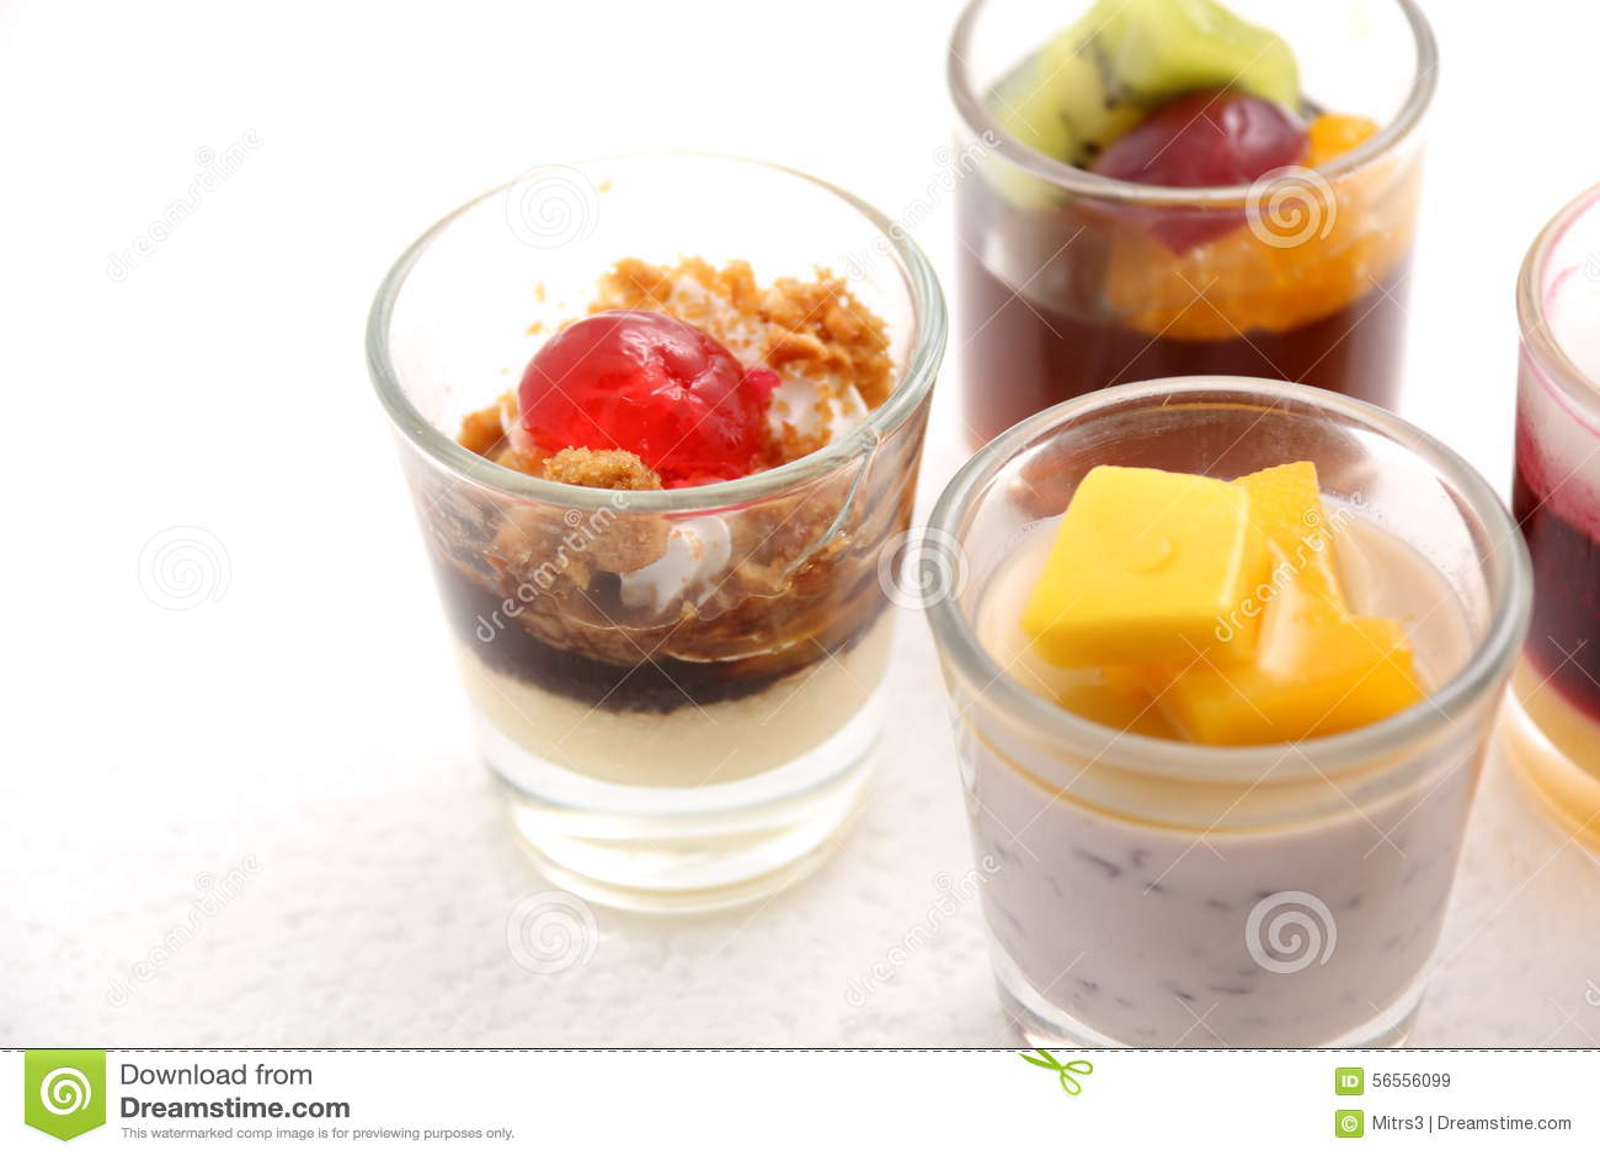 Download Γλυκά επιδόρπια στο γυαλί στοκ εικόνα. εικόνα από μικρός - 56556099